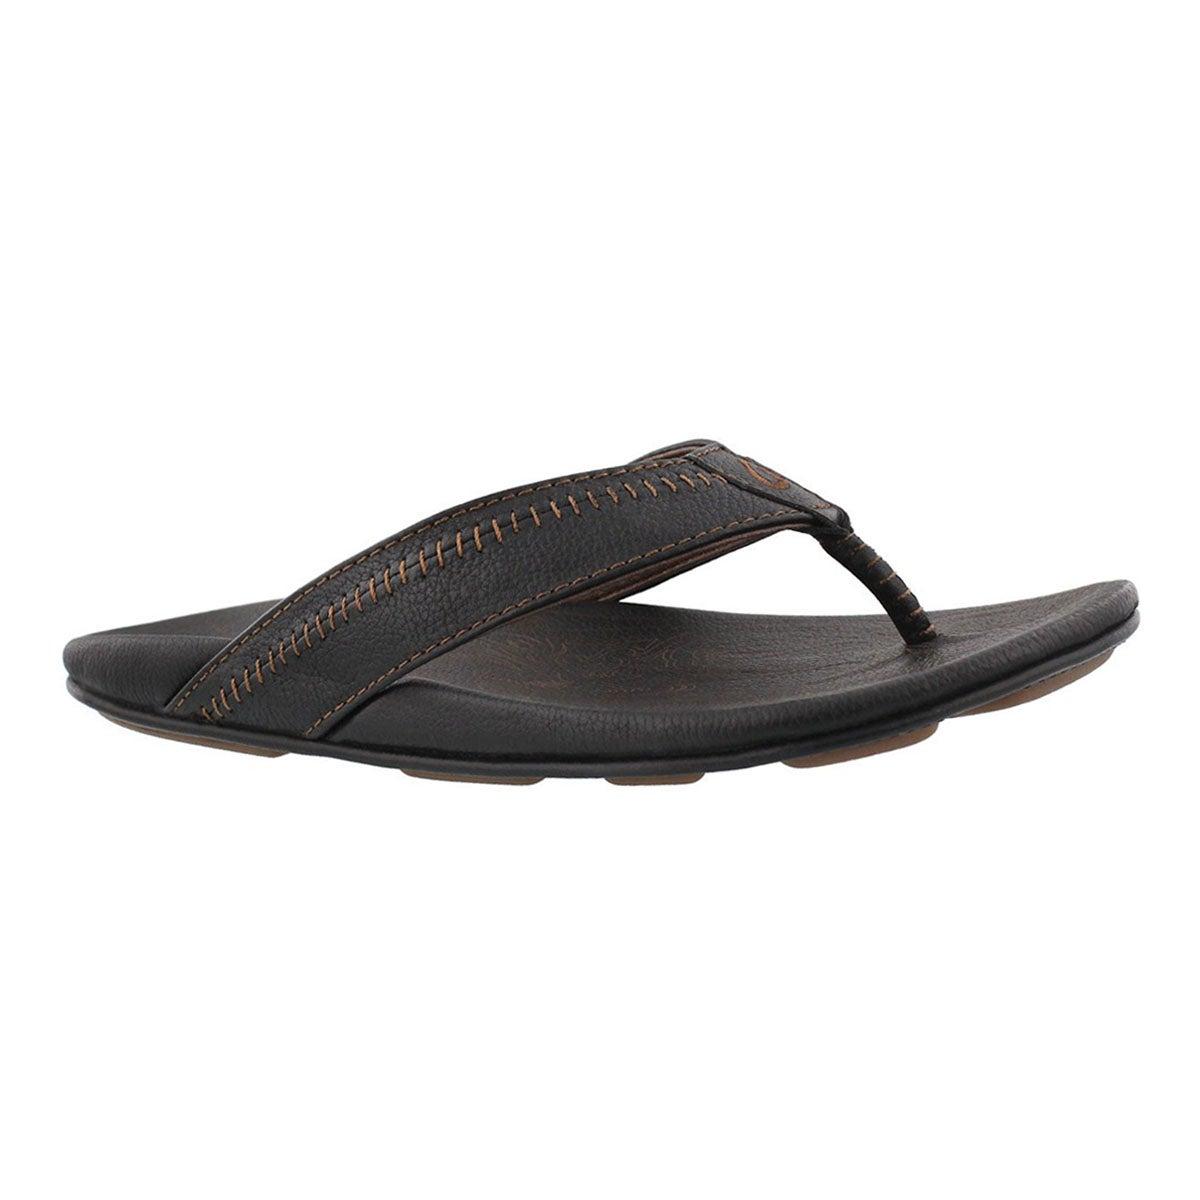 Men's HIAPO black/black thong sandals